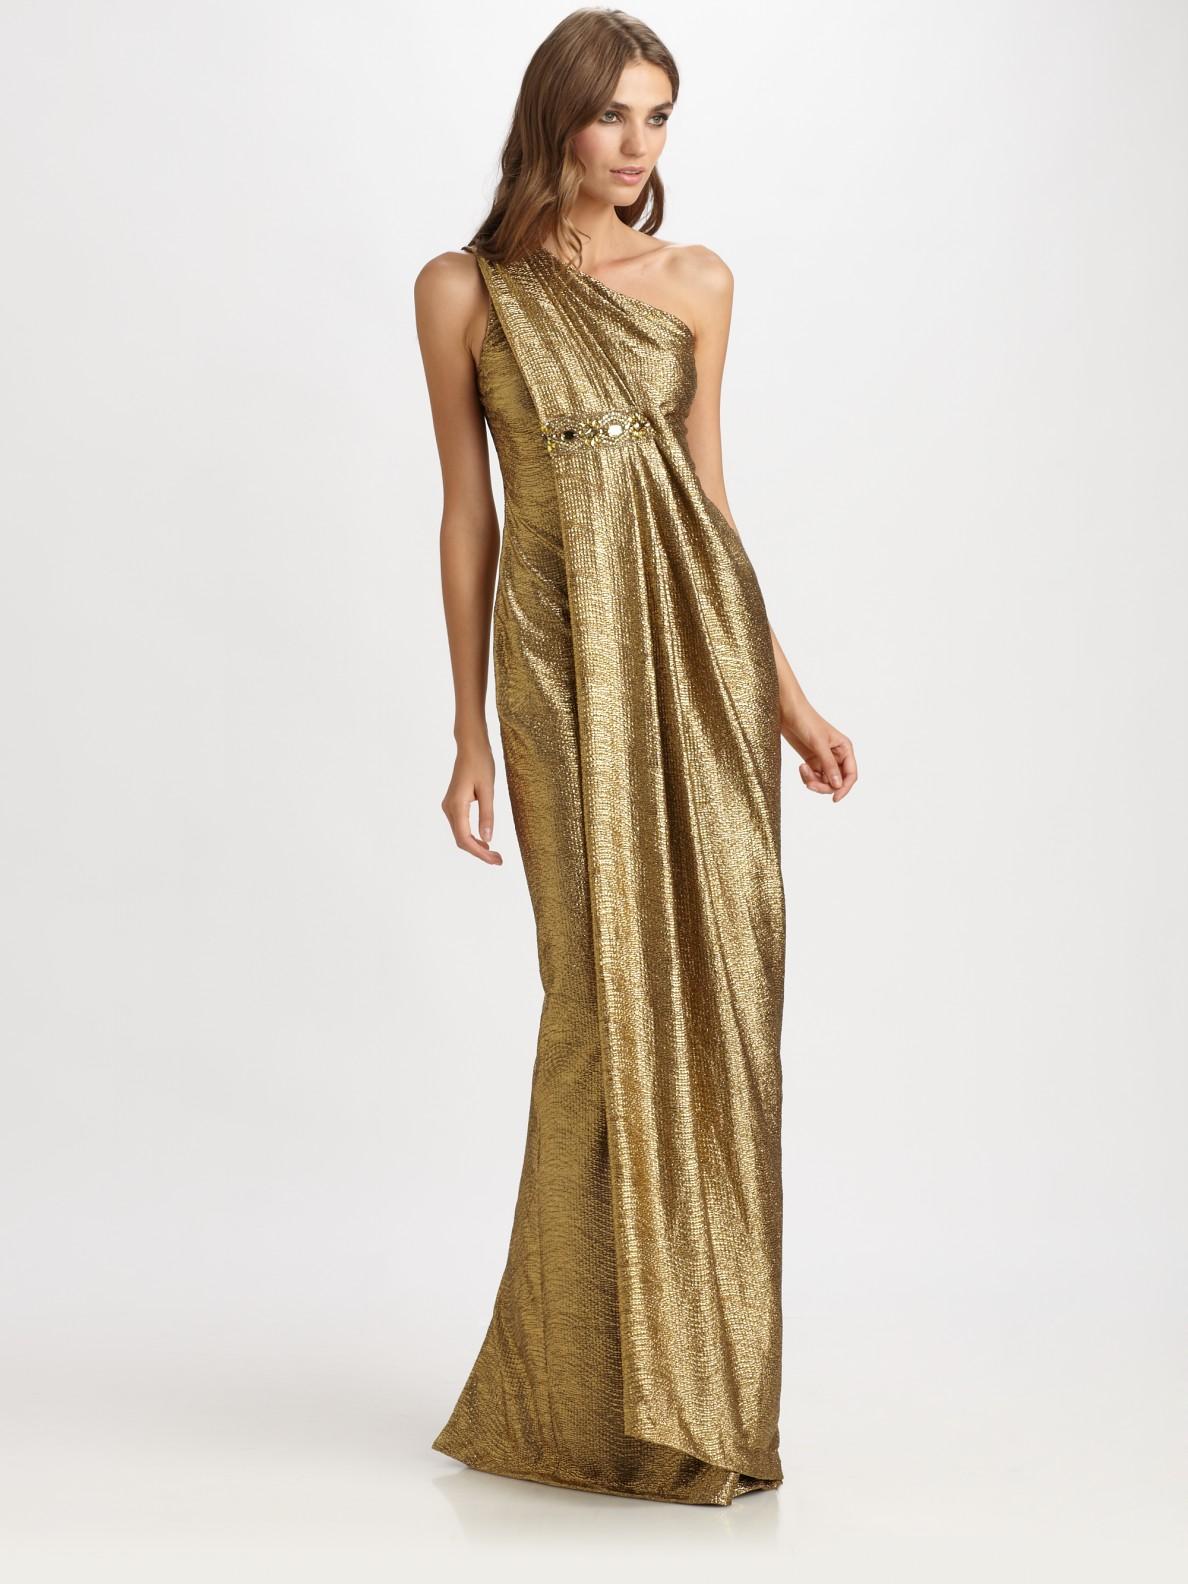 Dresses Designers Evening